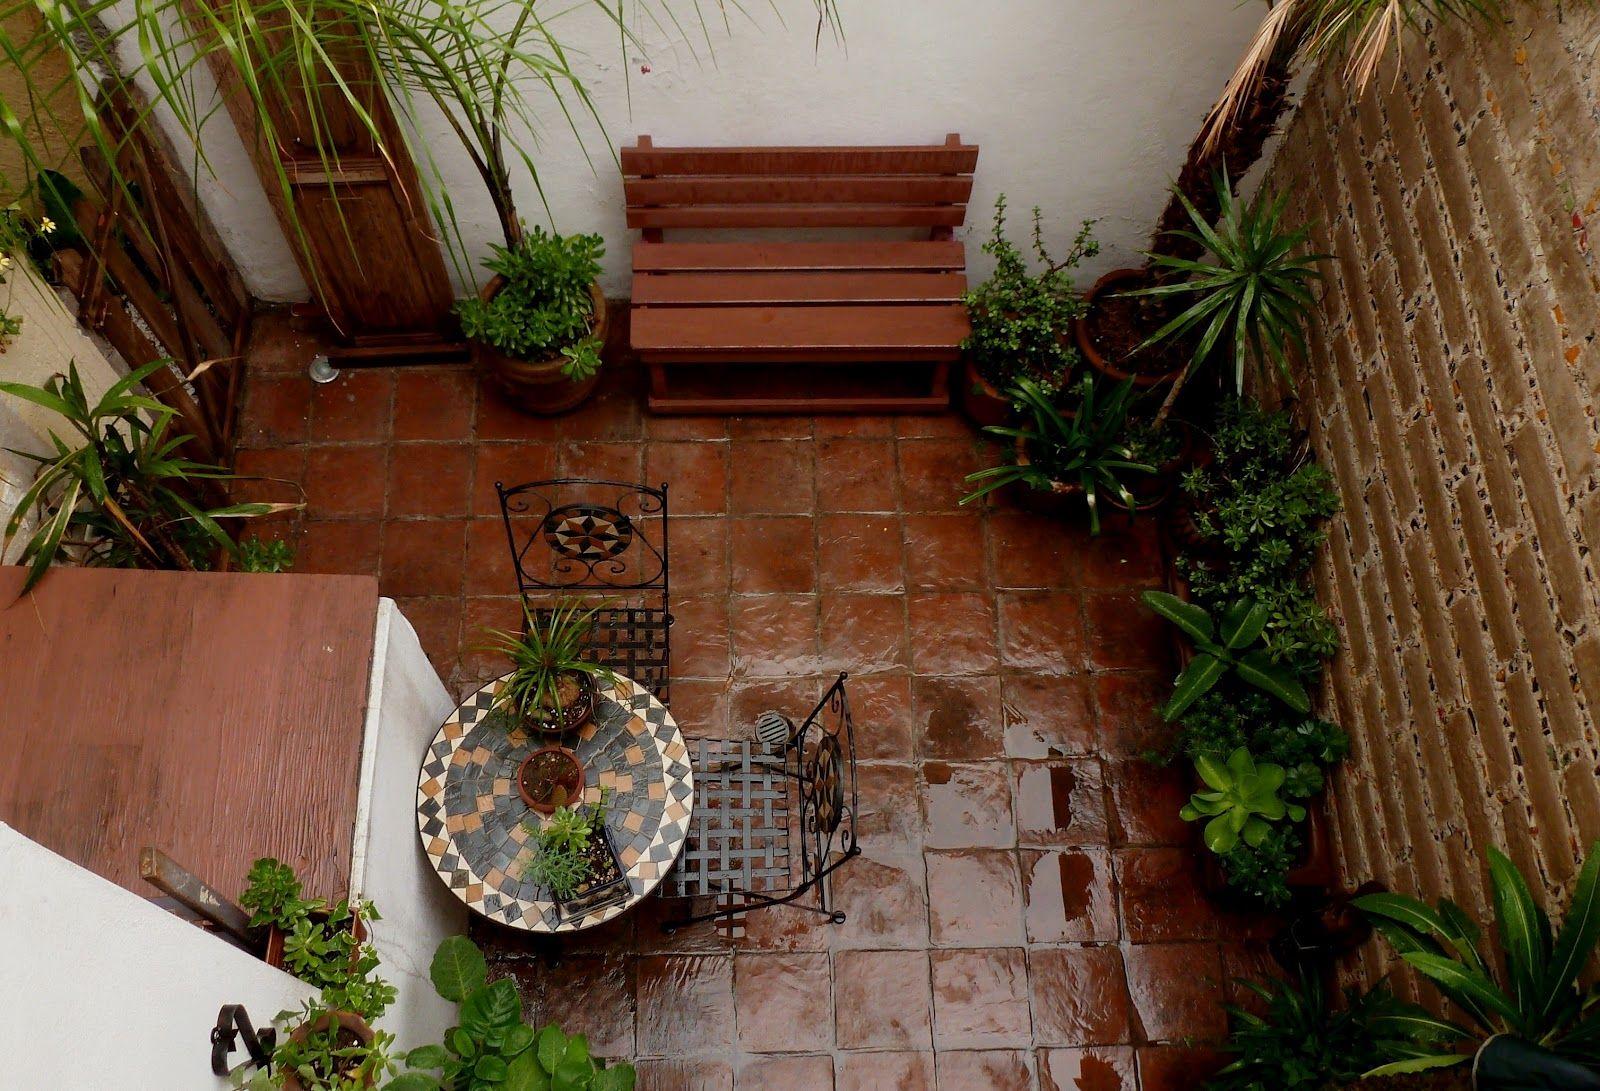 Patio interior peque o rincon de charla patios y for Terrazas para patios pequenos